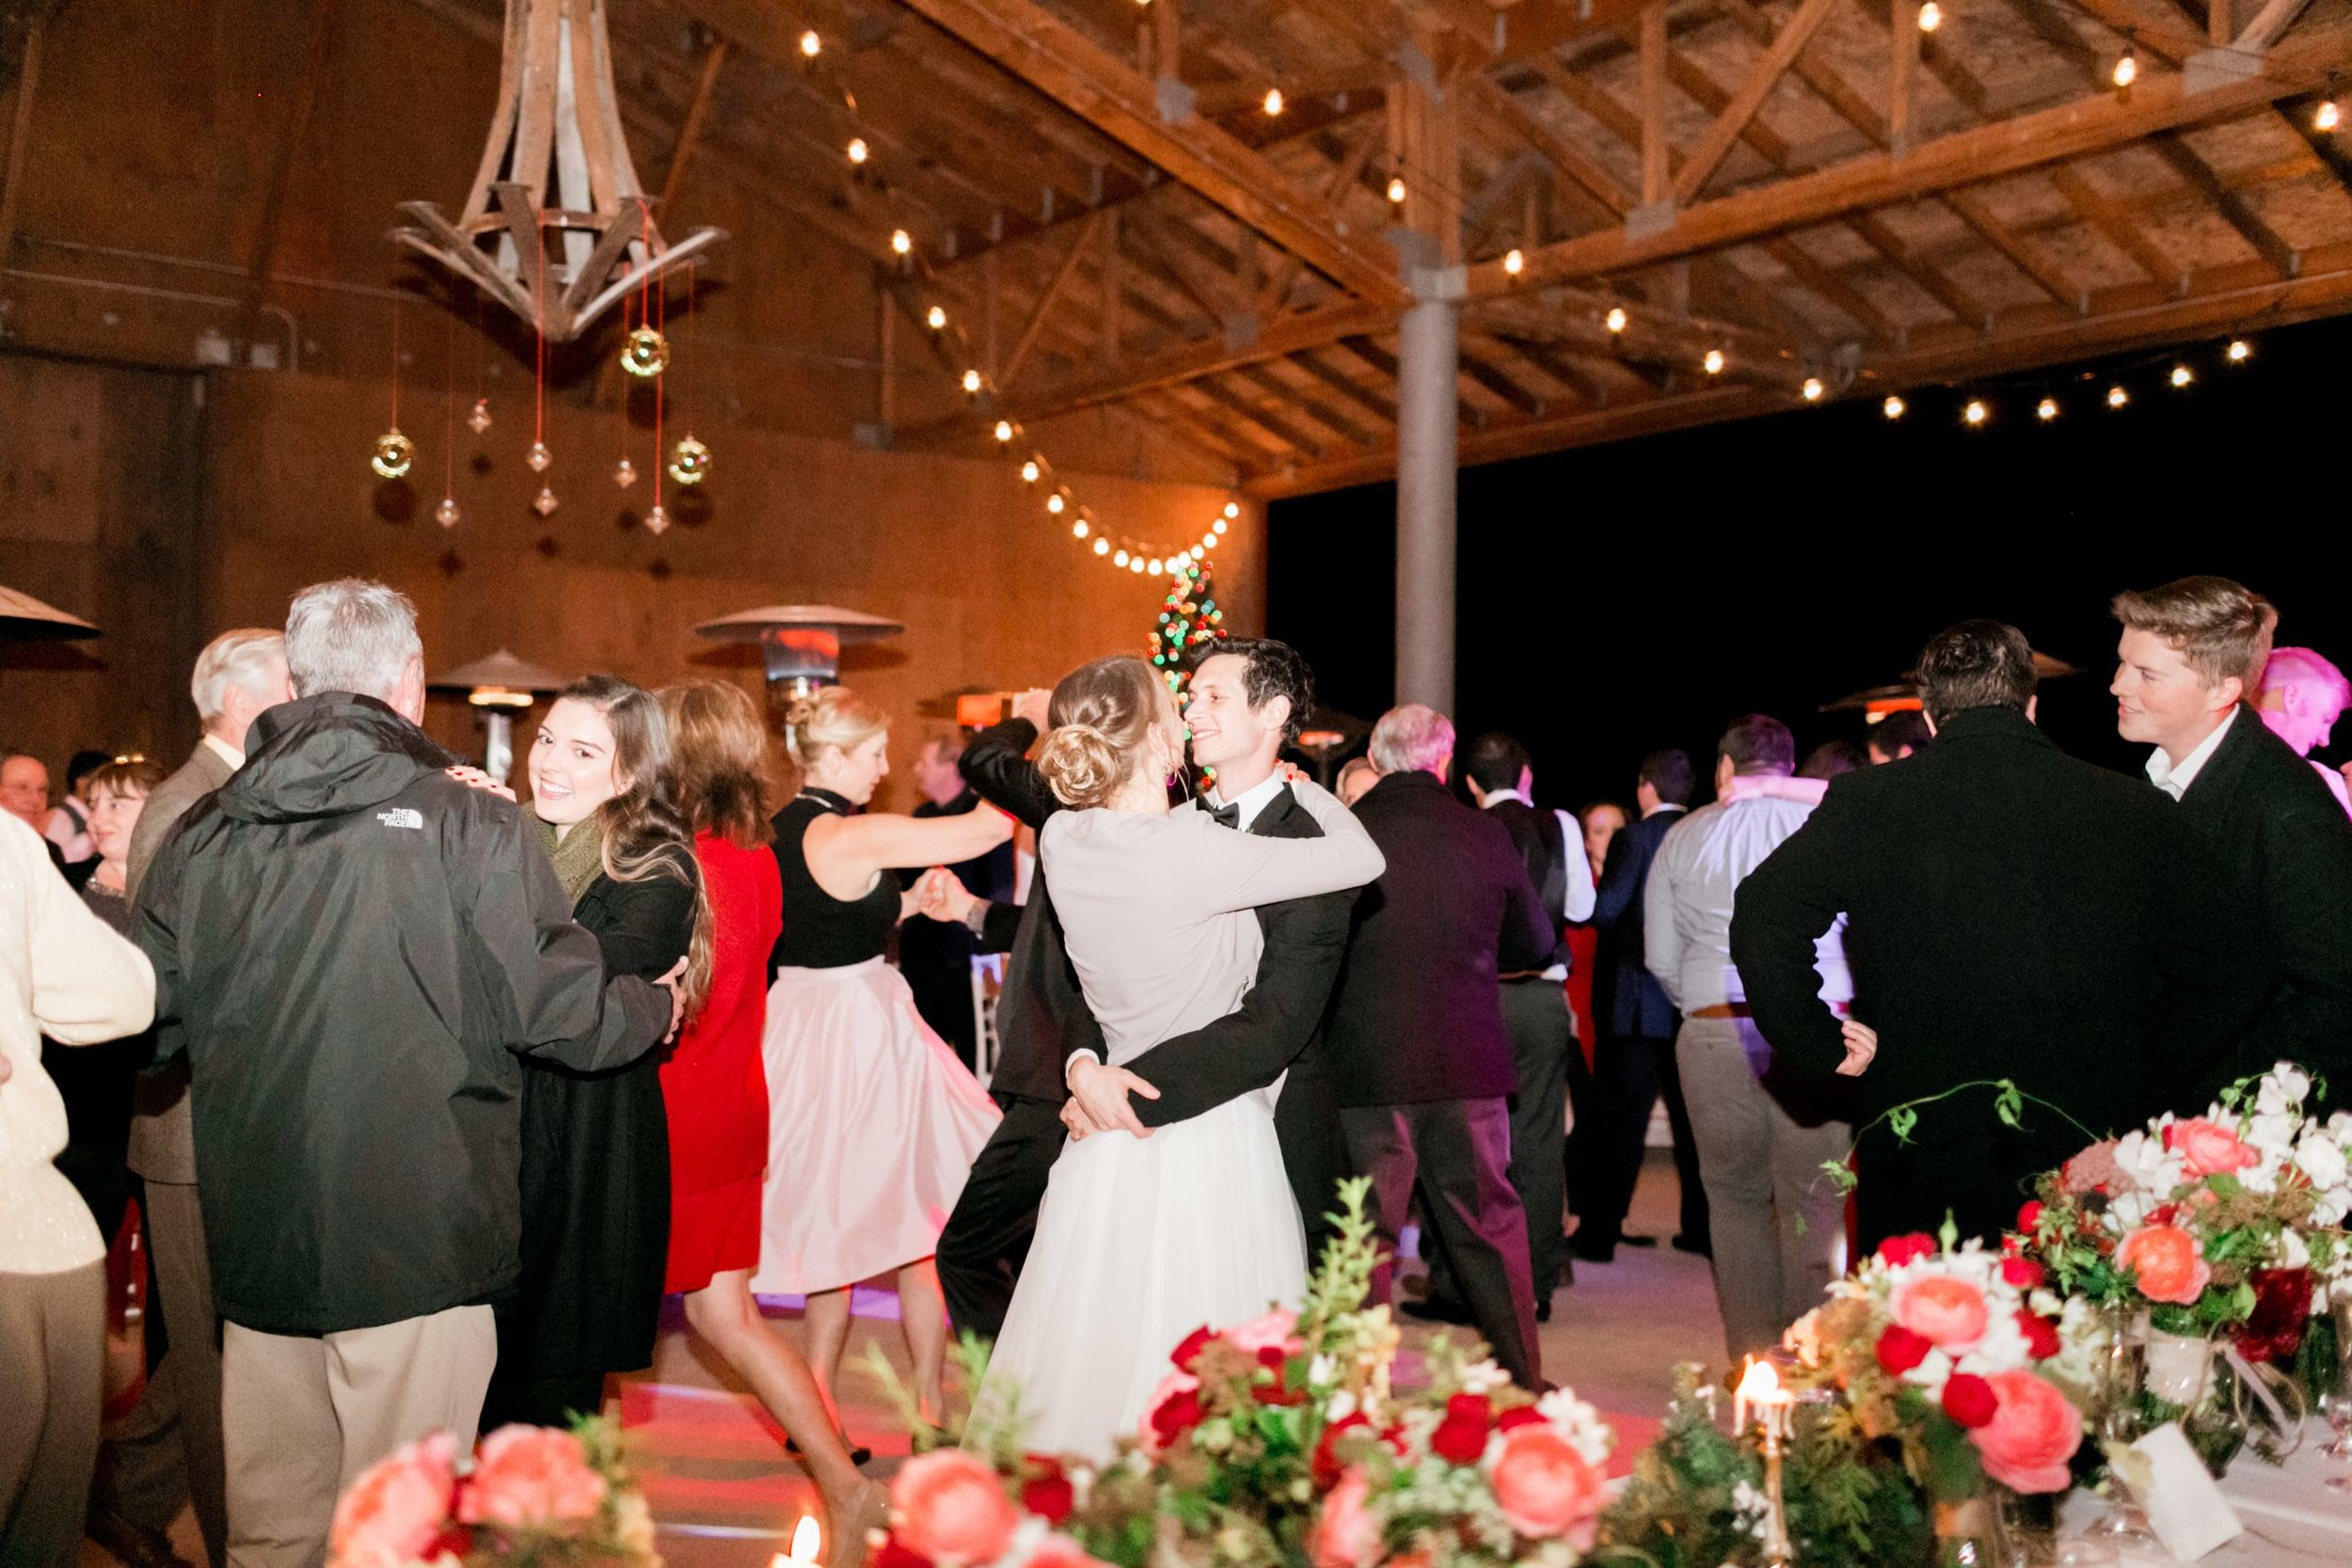 Natalie_Schutt_Photography_Winter_Wedding_San_Luis_Obispo-220.jpg